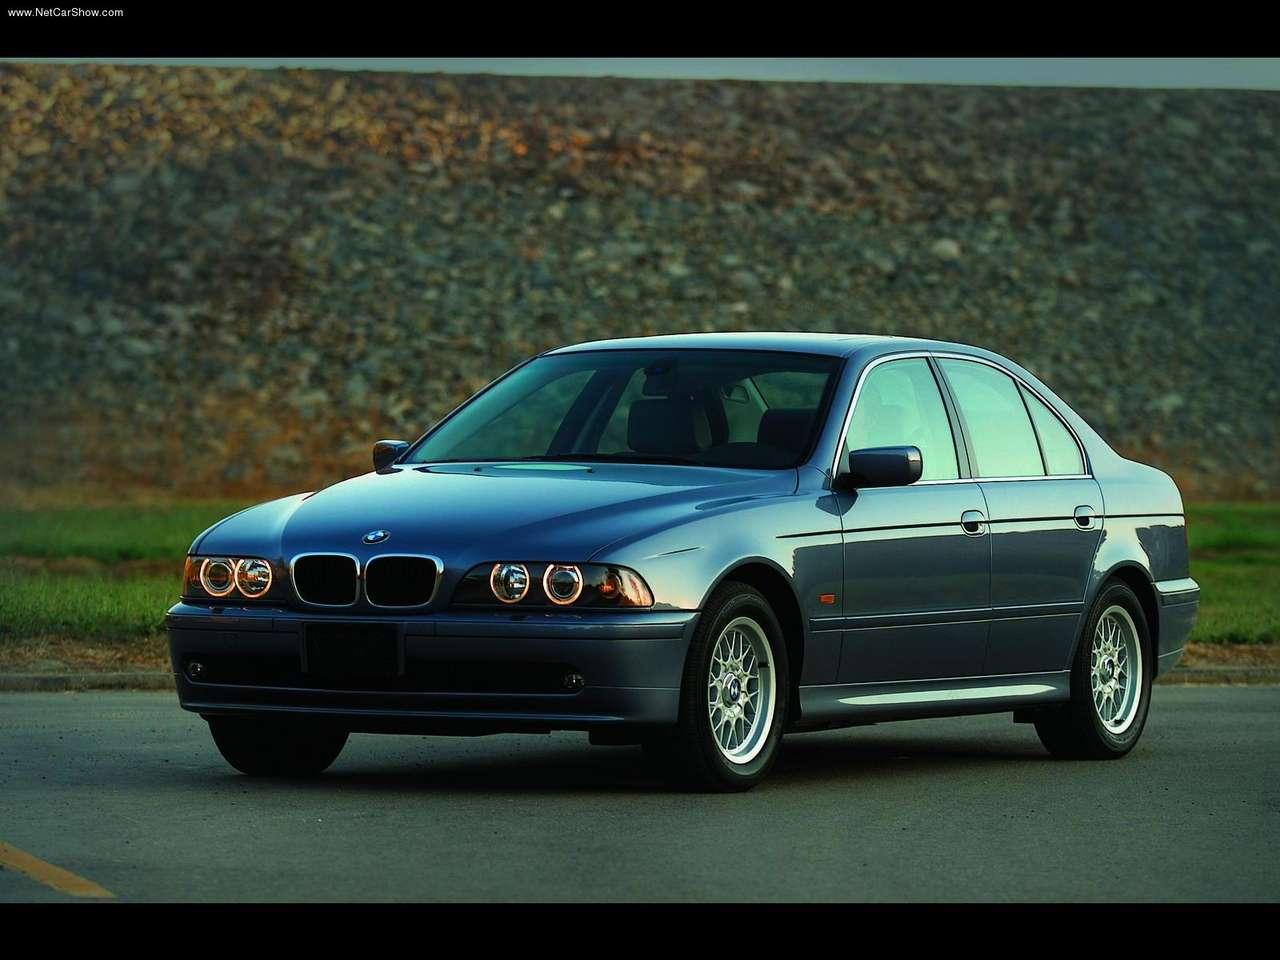 http://4.bp.blogspot.com/_xhqjRo6NERQ/S6808jGcO3I/AAAAAAAAGis/DbJYr2OImXA/s1600/BMW-525i_2001_1280x960_wallpaper_03.jpg